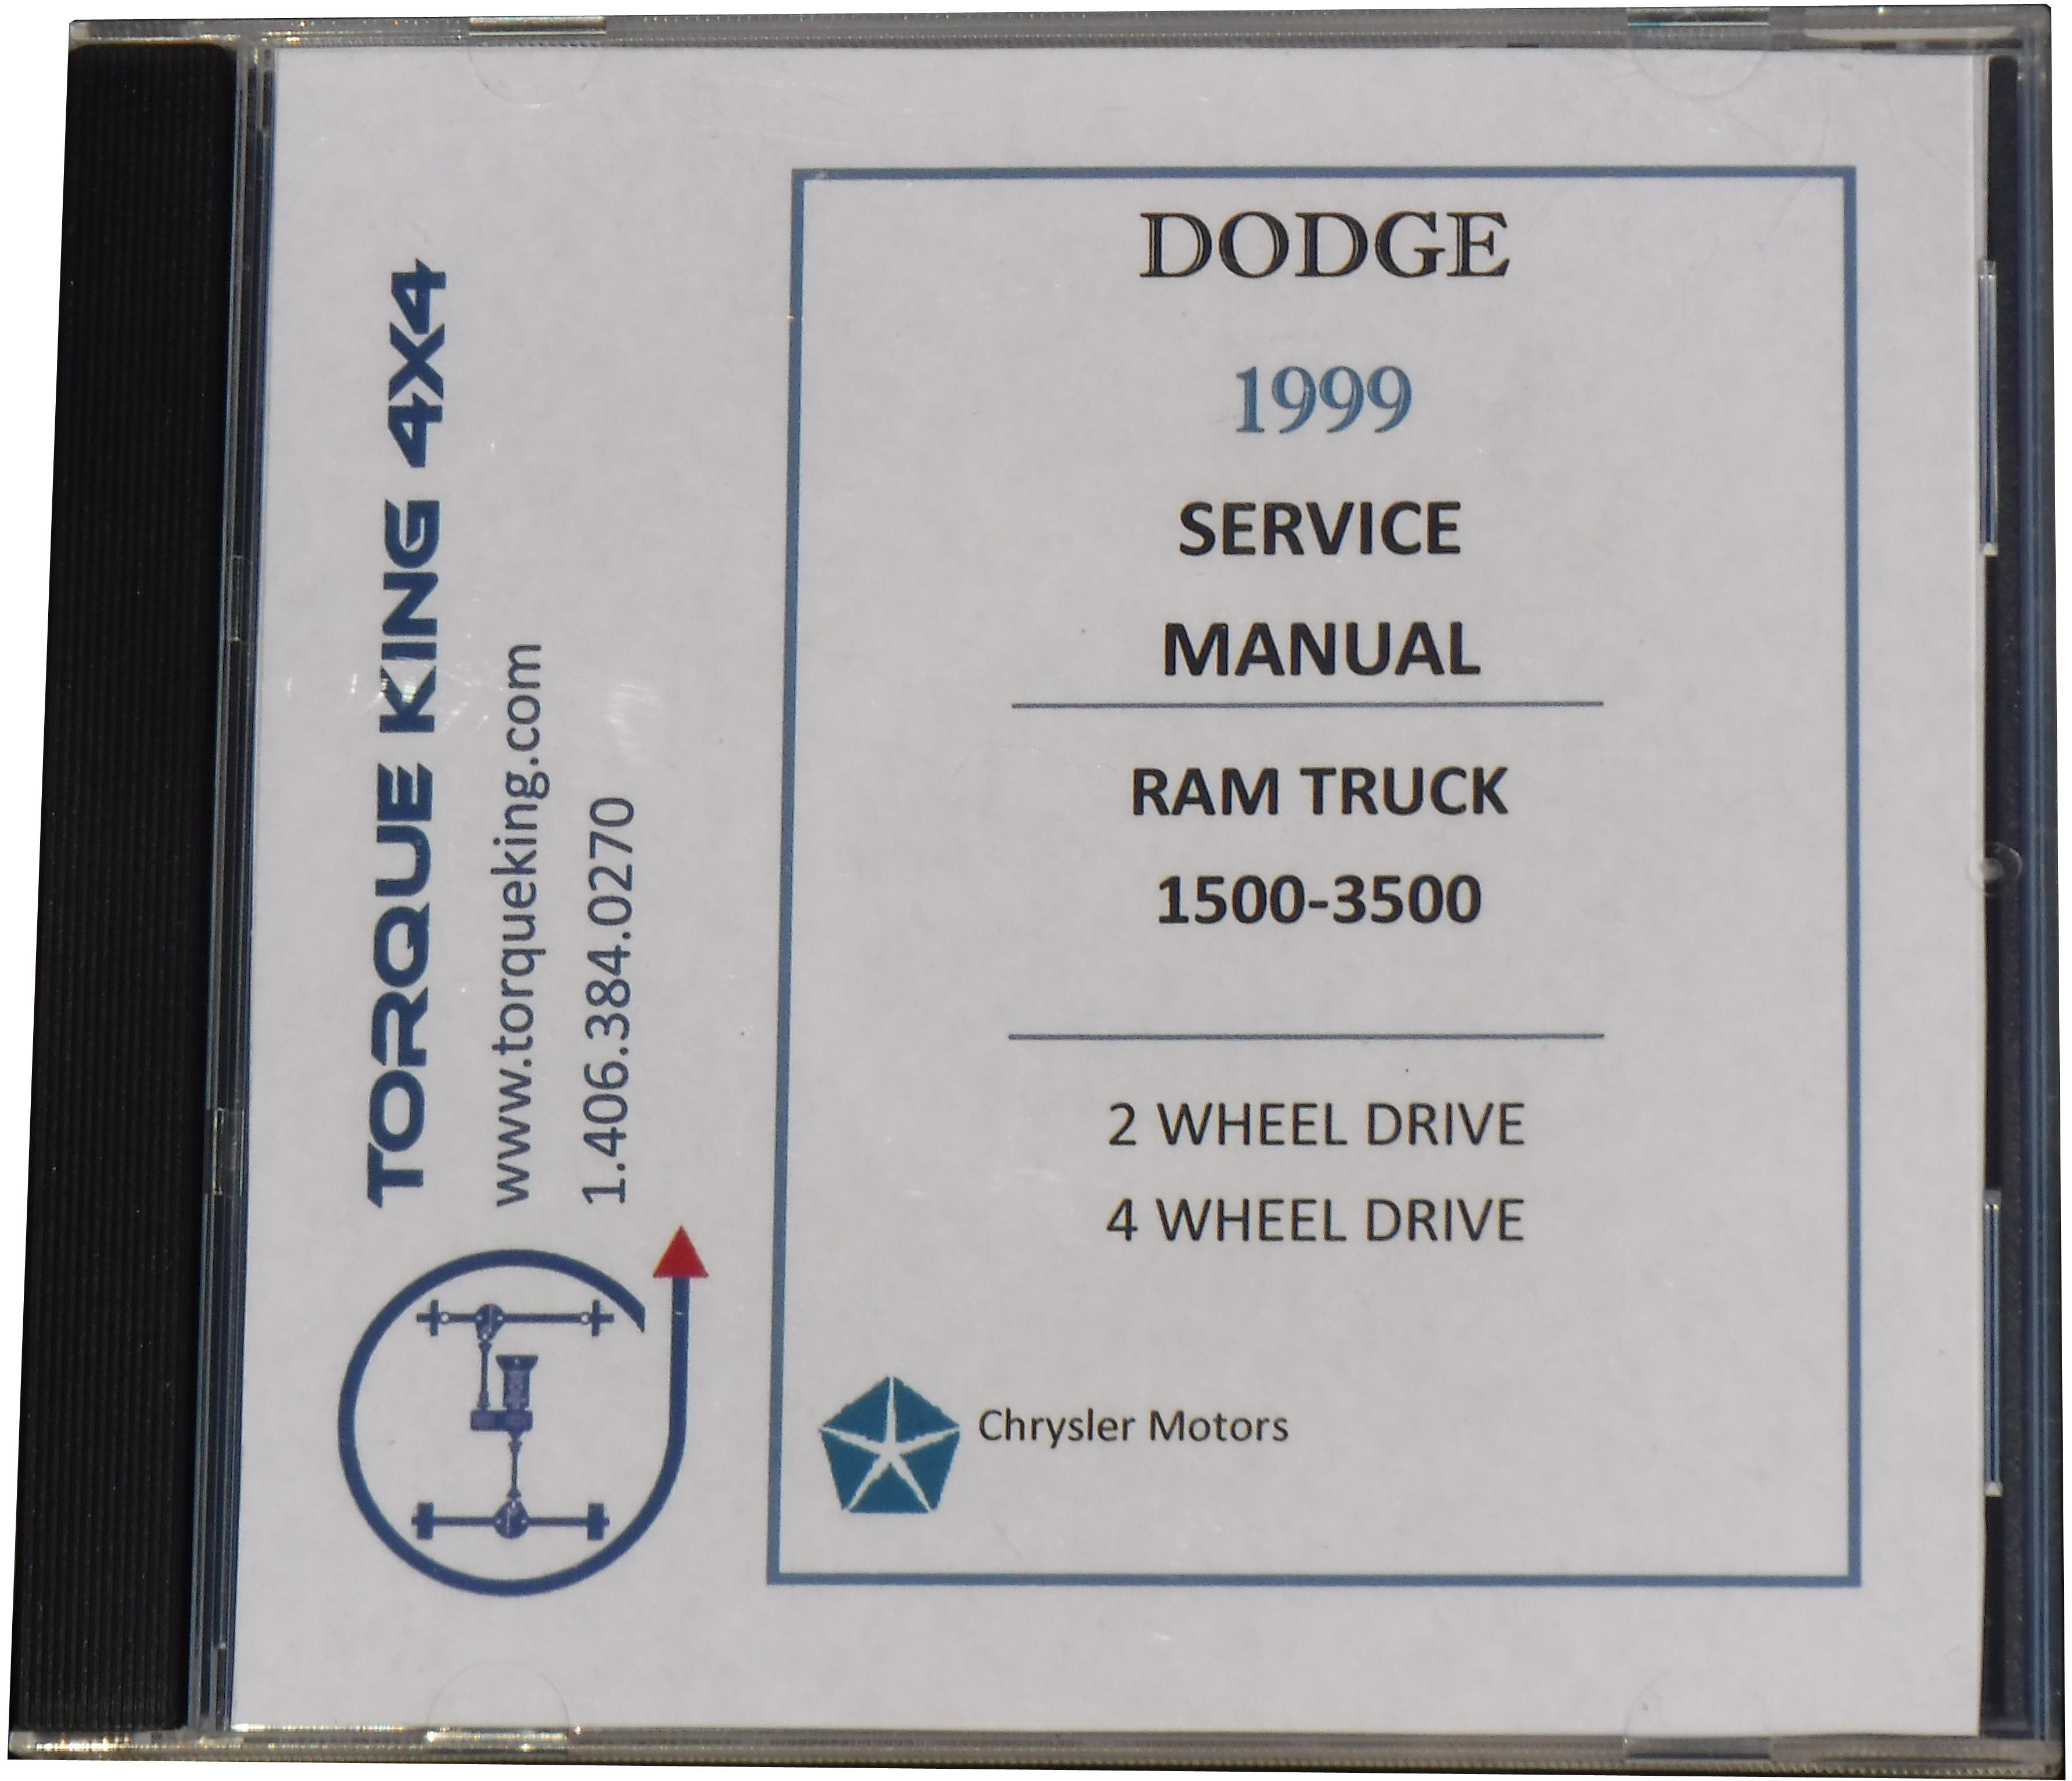 Nv4500 Parts Torque King 4x4 1994 Gmc 3500 Vss Wiring Diagrams Cddodgemanual